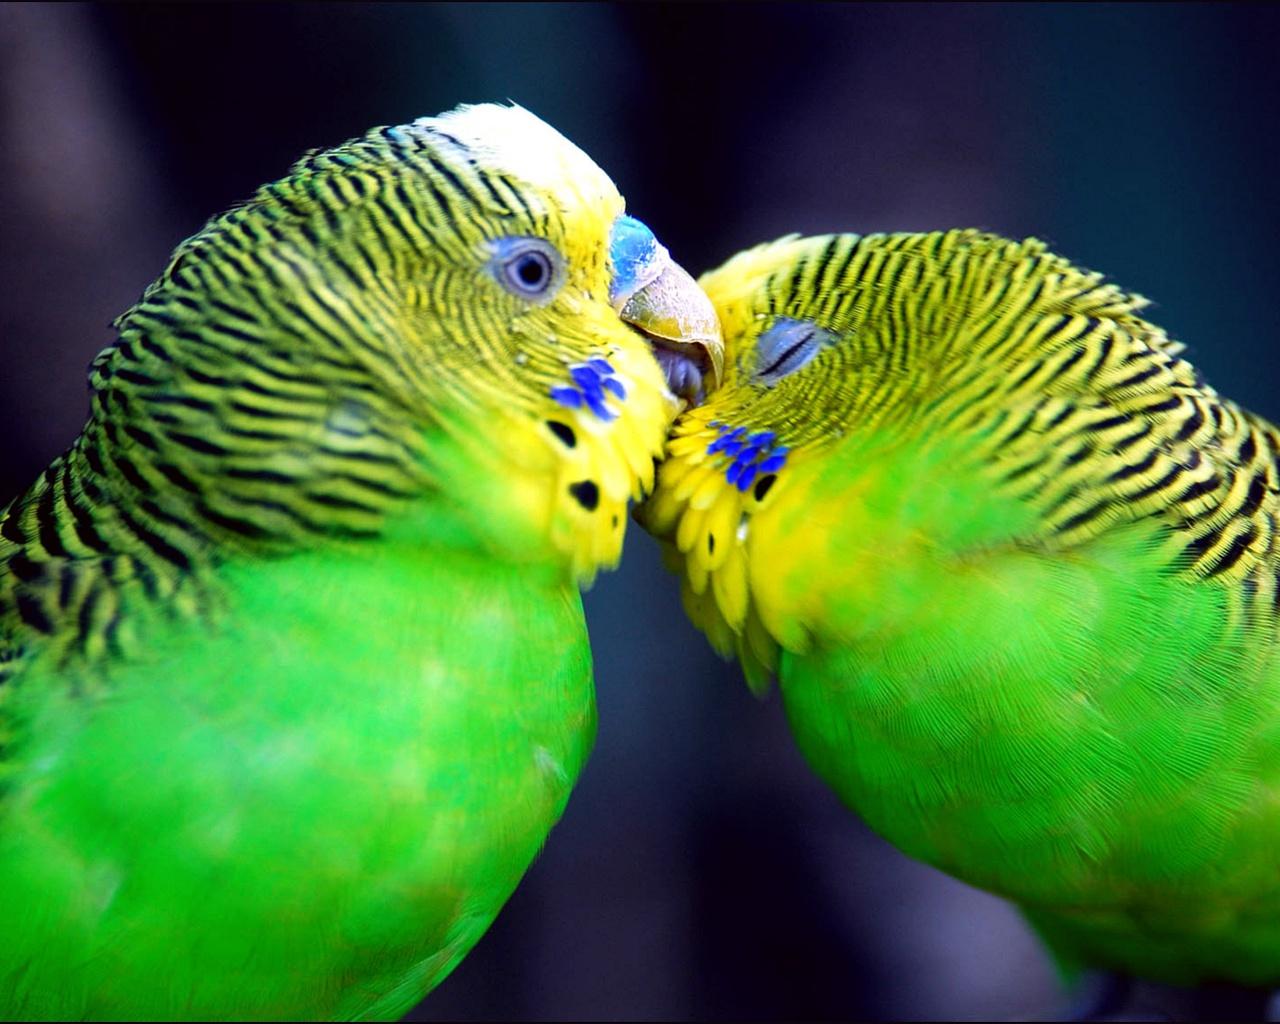 Wallpapers Love Birds: Wallpapers Fair: Love Wallpaper Design For Desktop